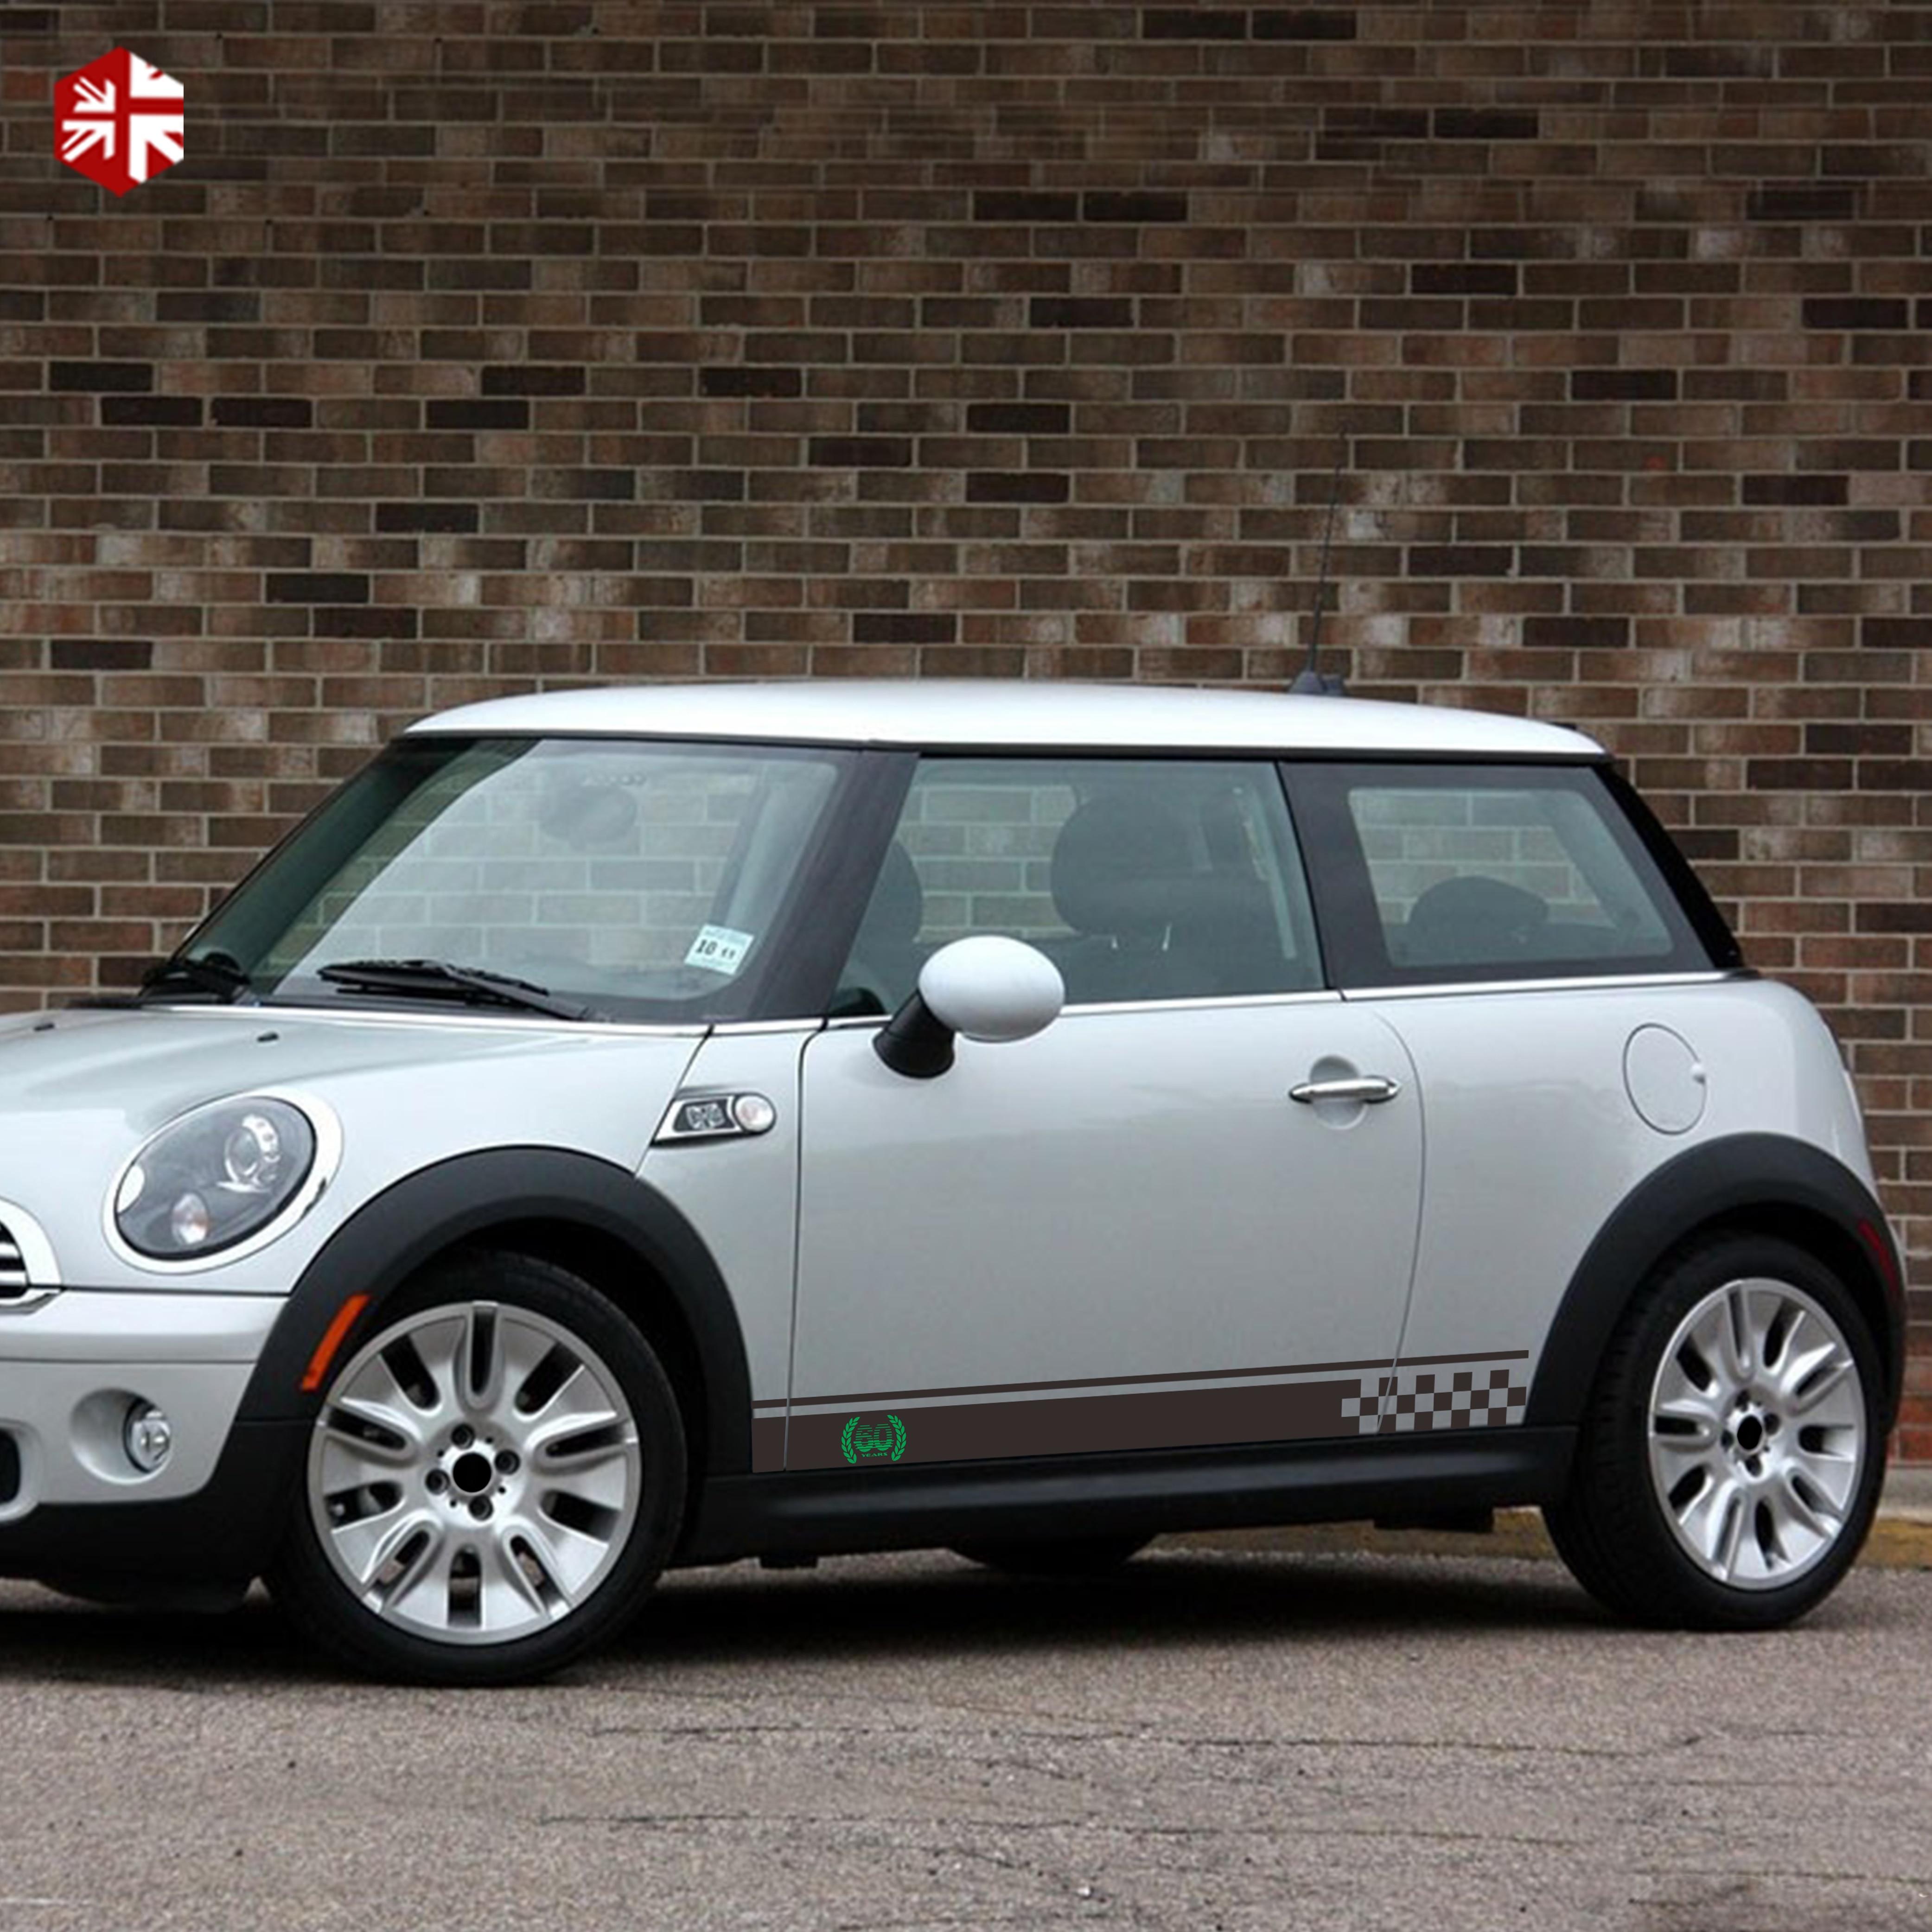 Mini Cooper Accessories 2013 >> Best Price 3e99 2 Pcs 60th Anniversary Decal Car Door